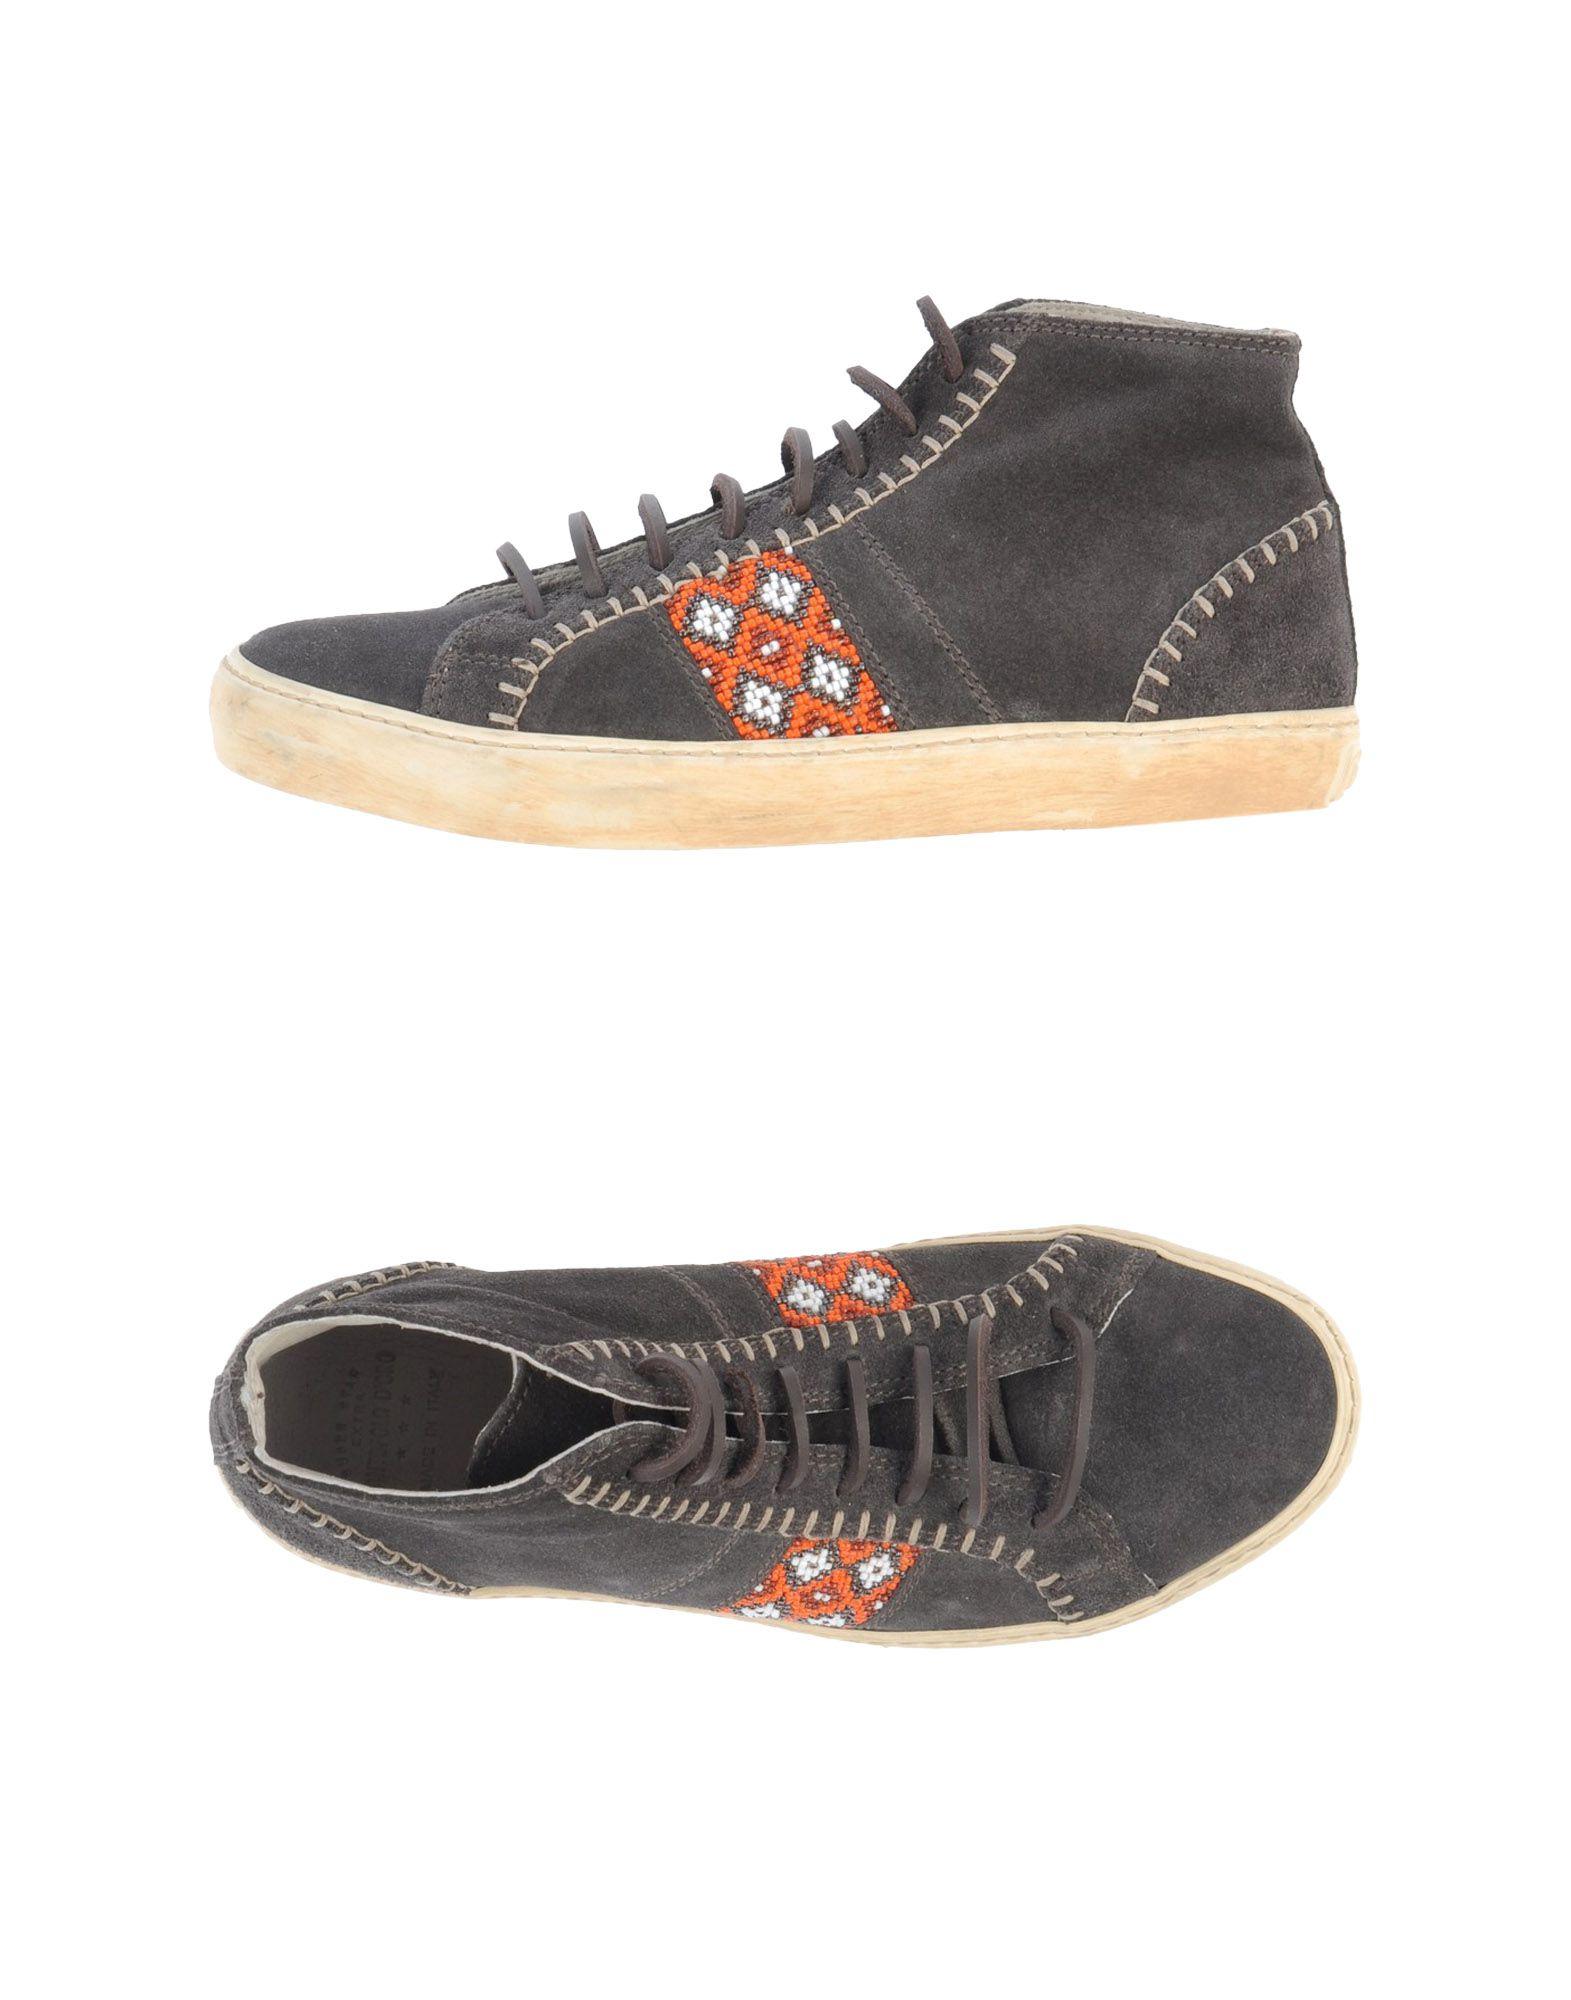 Scarpe Donna da Ginnastica Pantofola D'oro Donna Scarpe - 44632510MR b19d5f